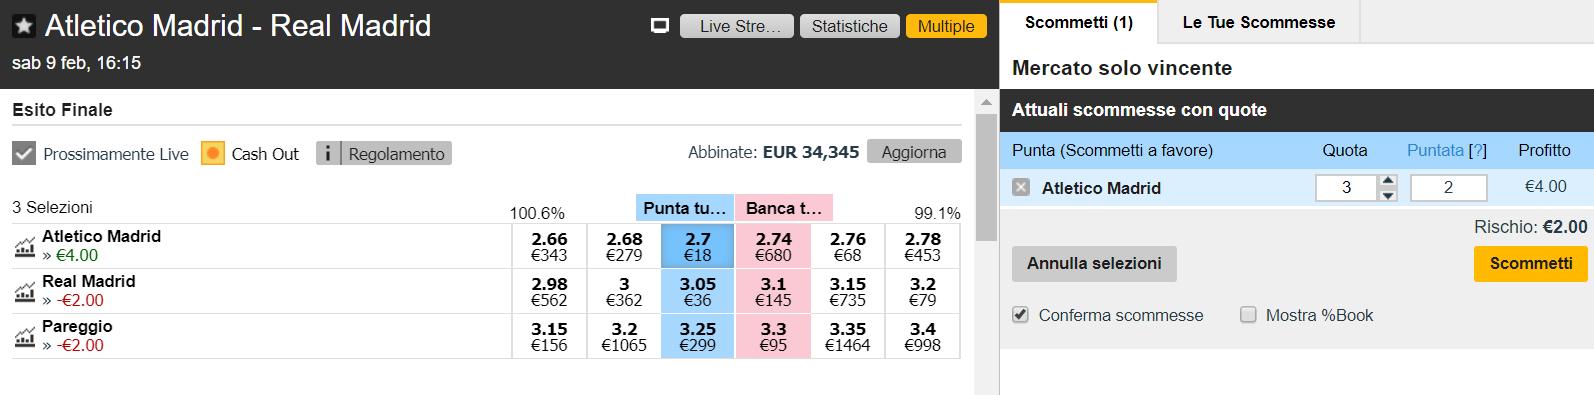 Atletico Madrid vs. Real Madrid - Back 1 - Importo € 2